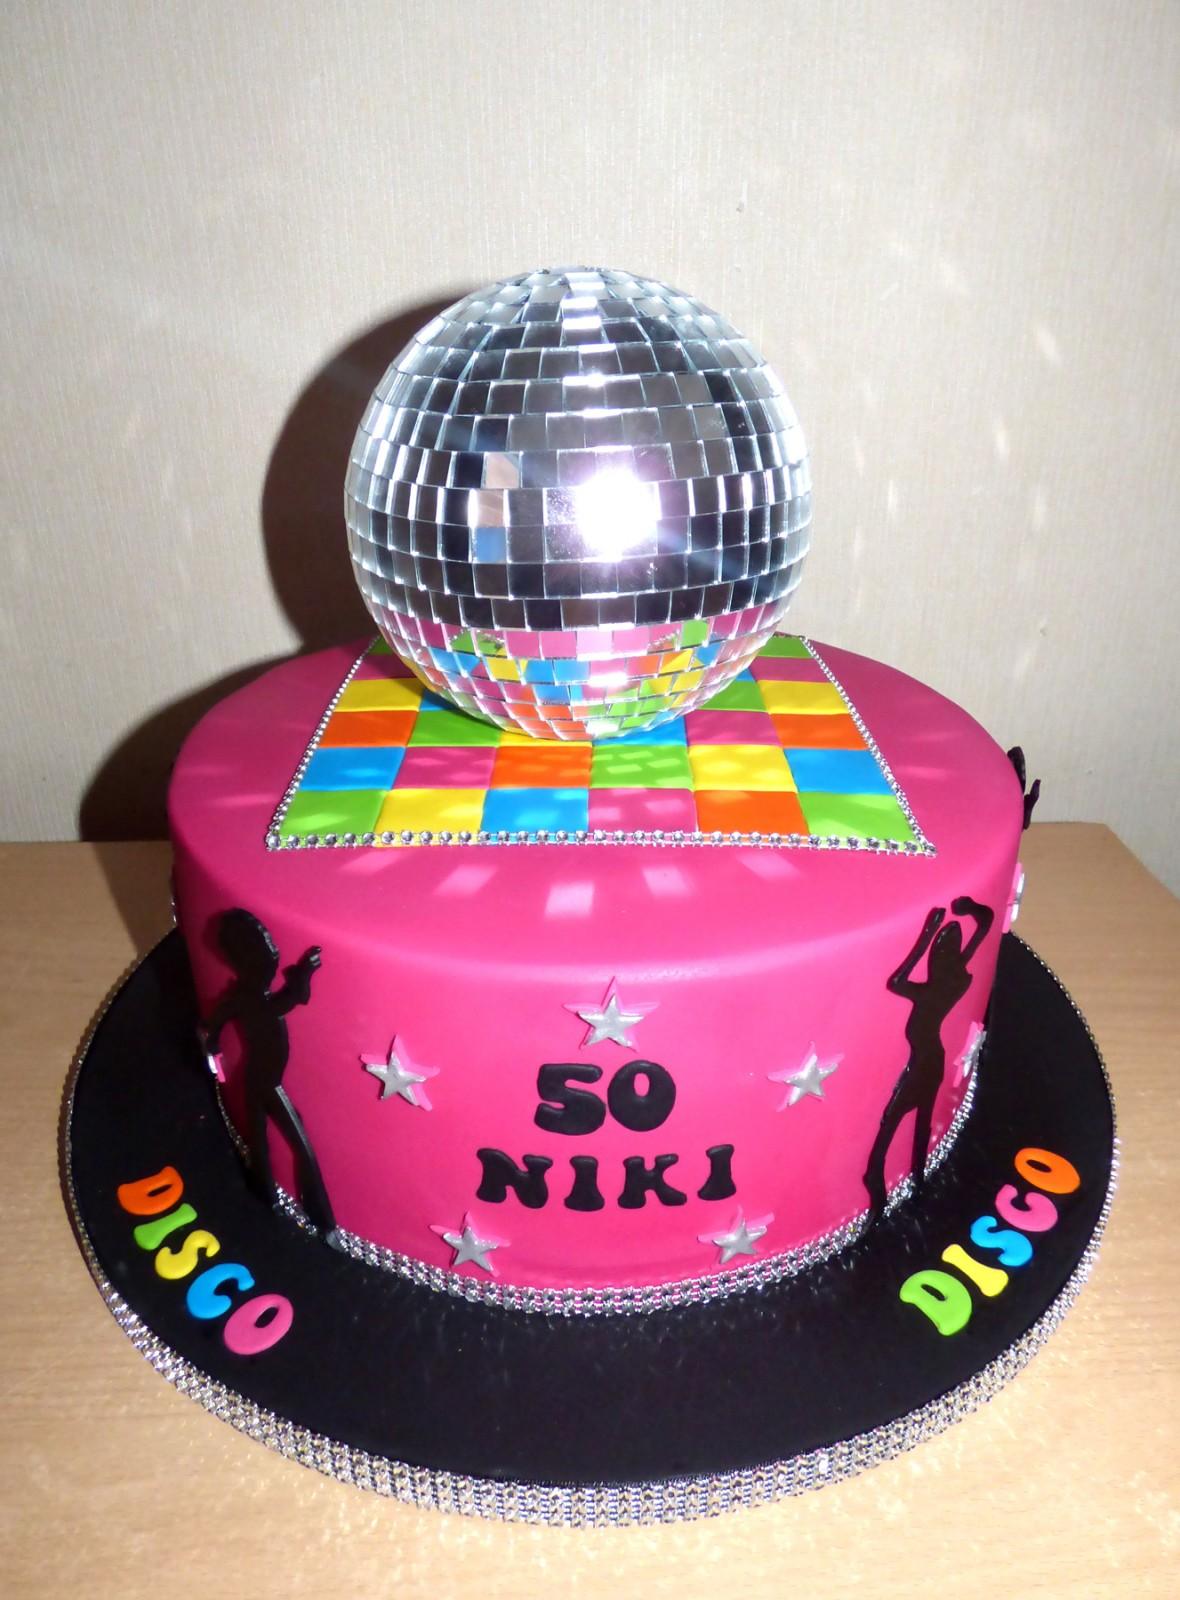 Enjoyable Disco Glitterball Cake Susies Cakes Funny Birthday Cards Online Hendilapandamsfinfo